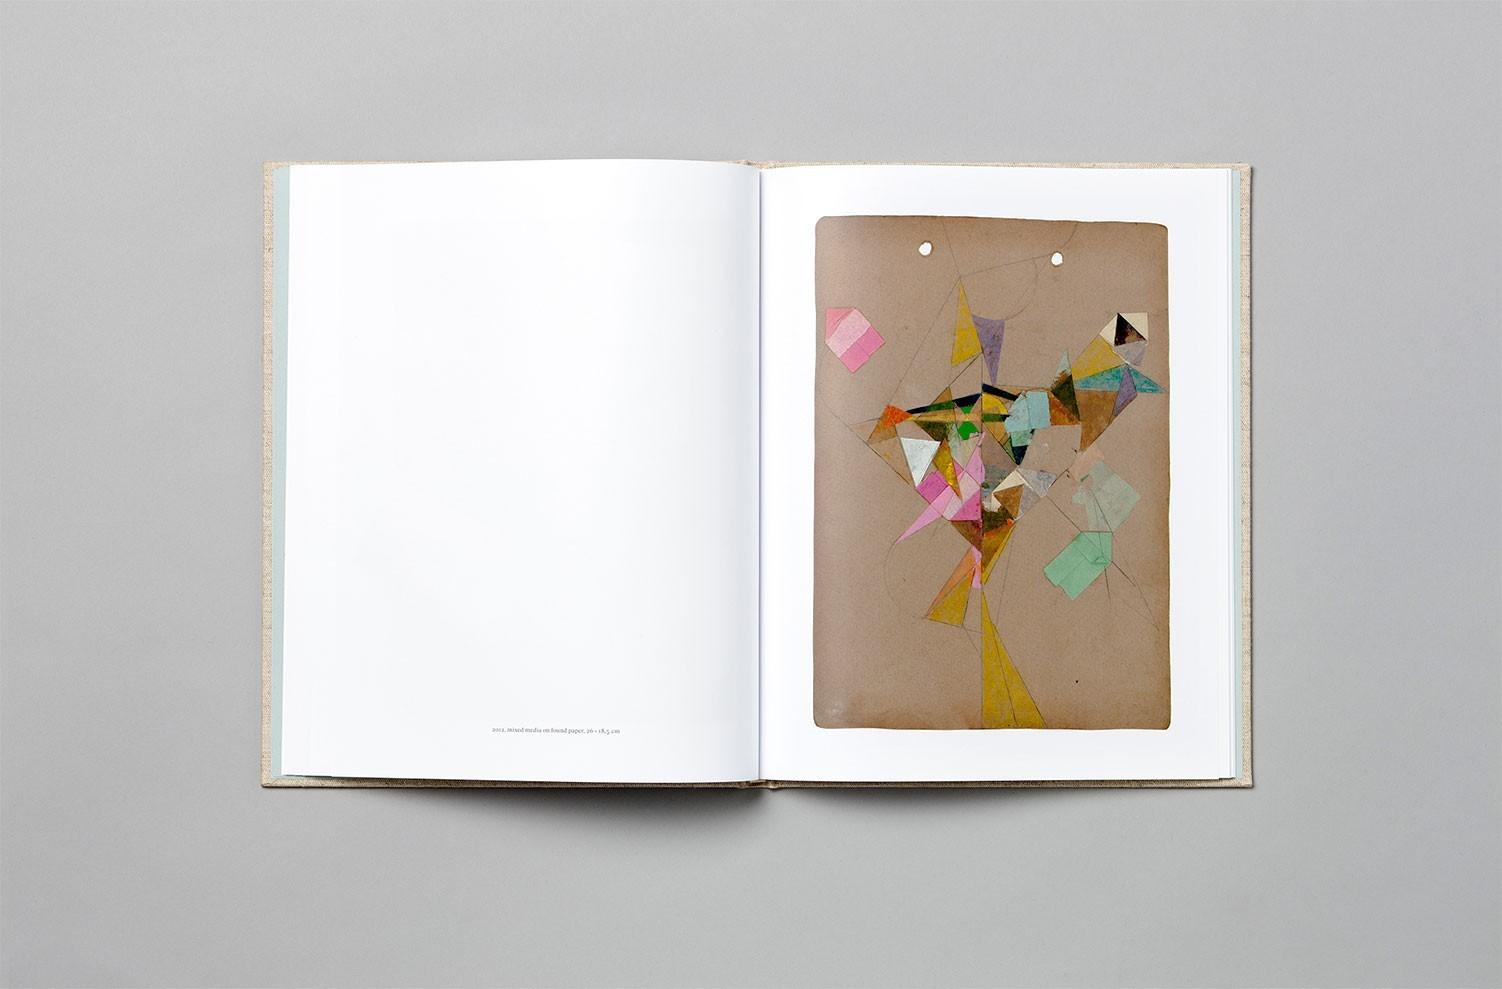 ritator_hans_andersson_artist_book_7